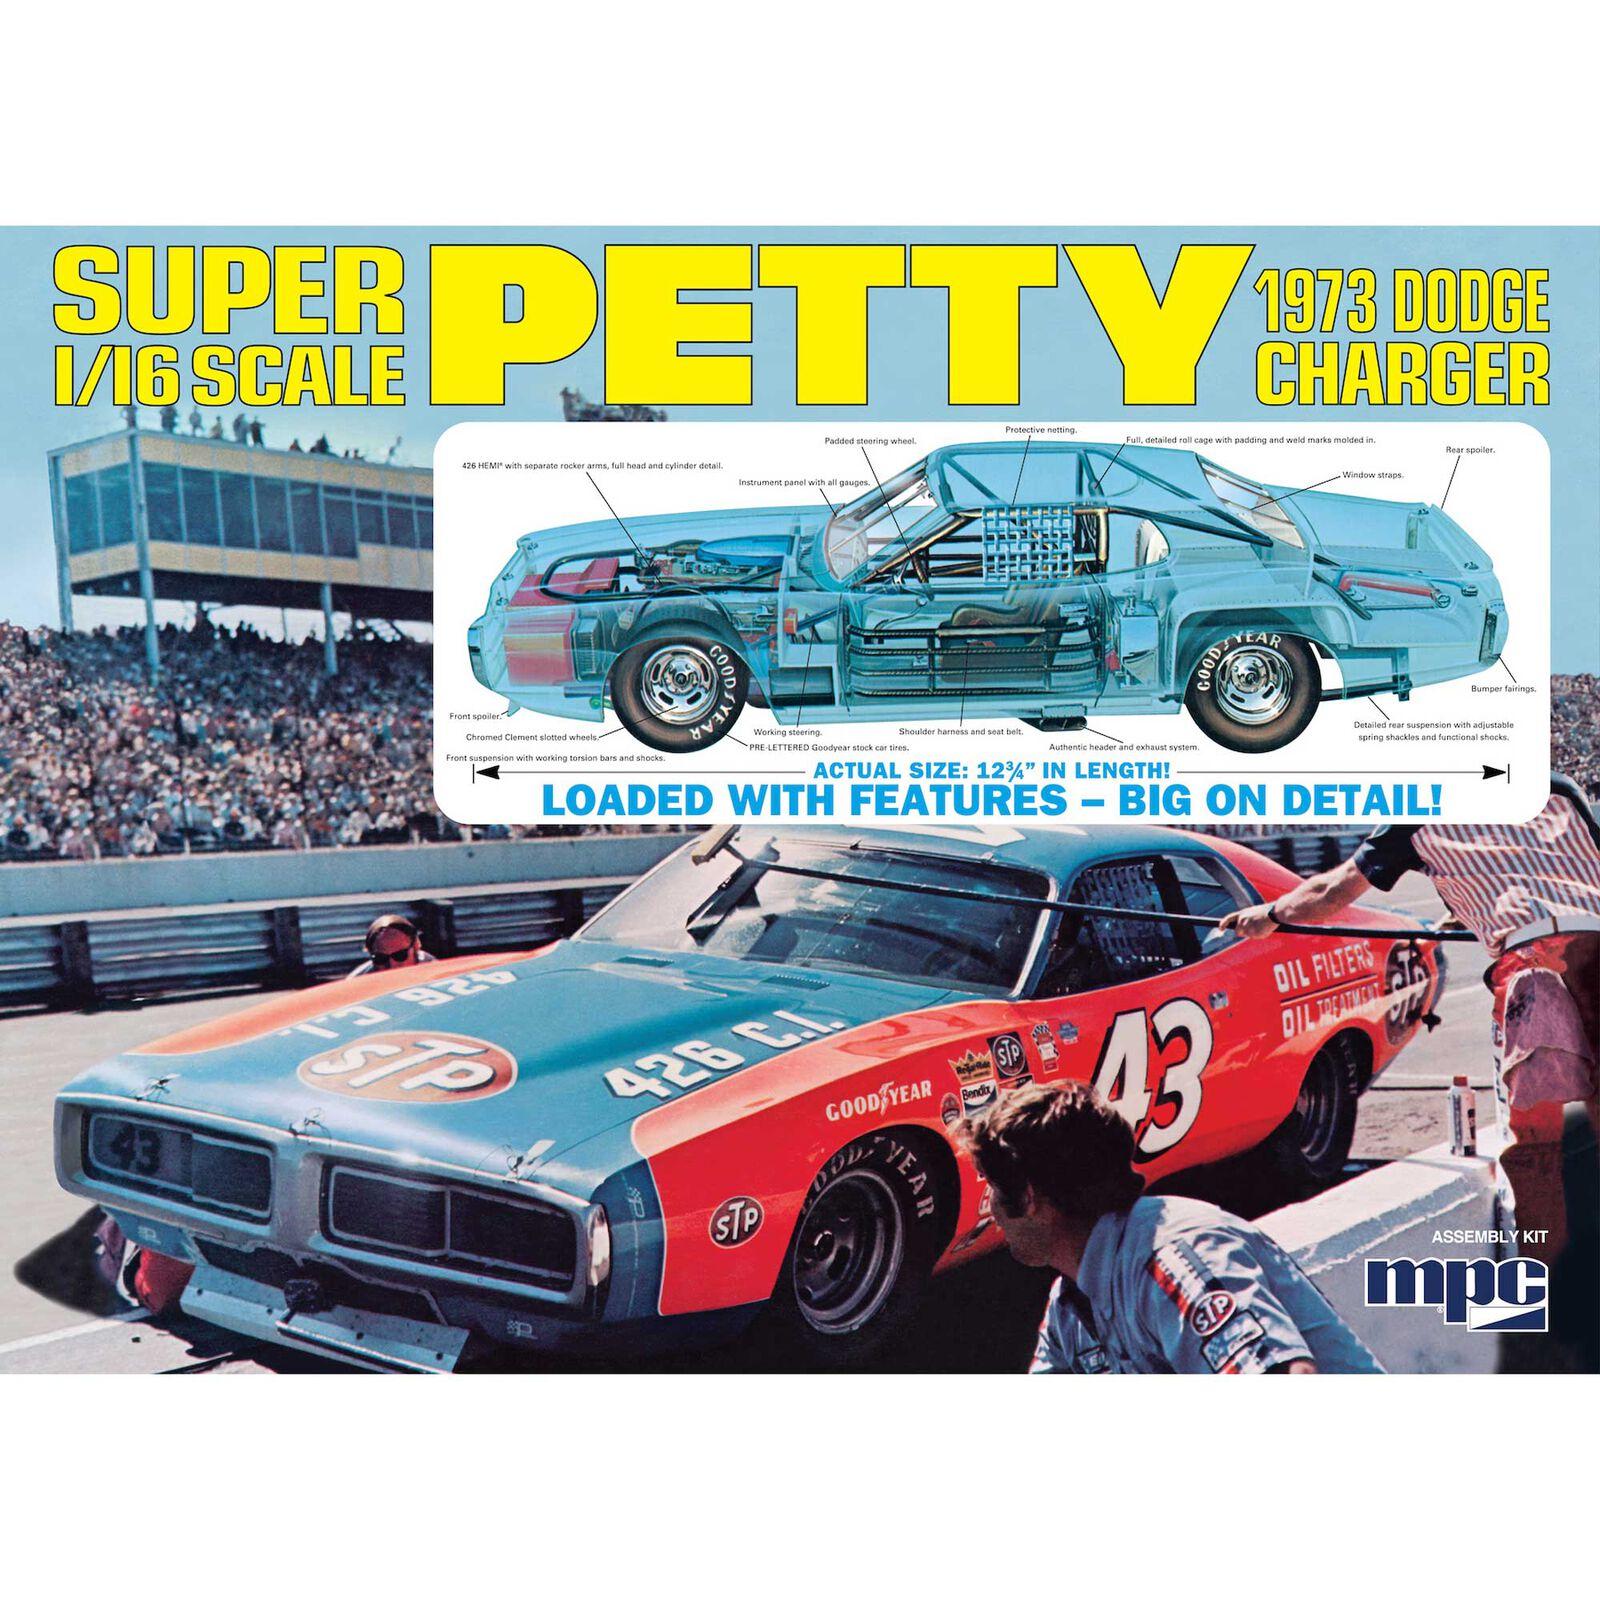 1/16 Richard Petty 1973 Dodge Charger